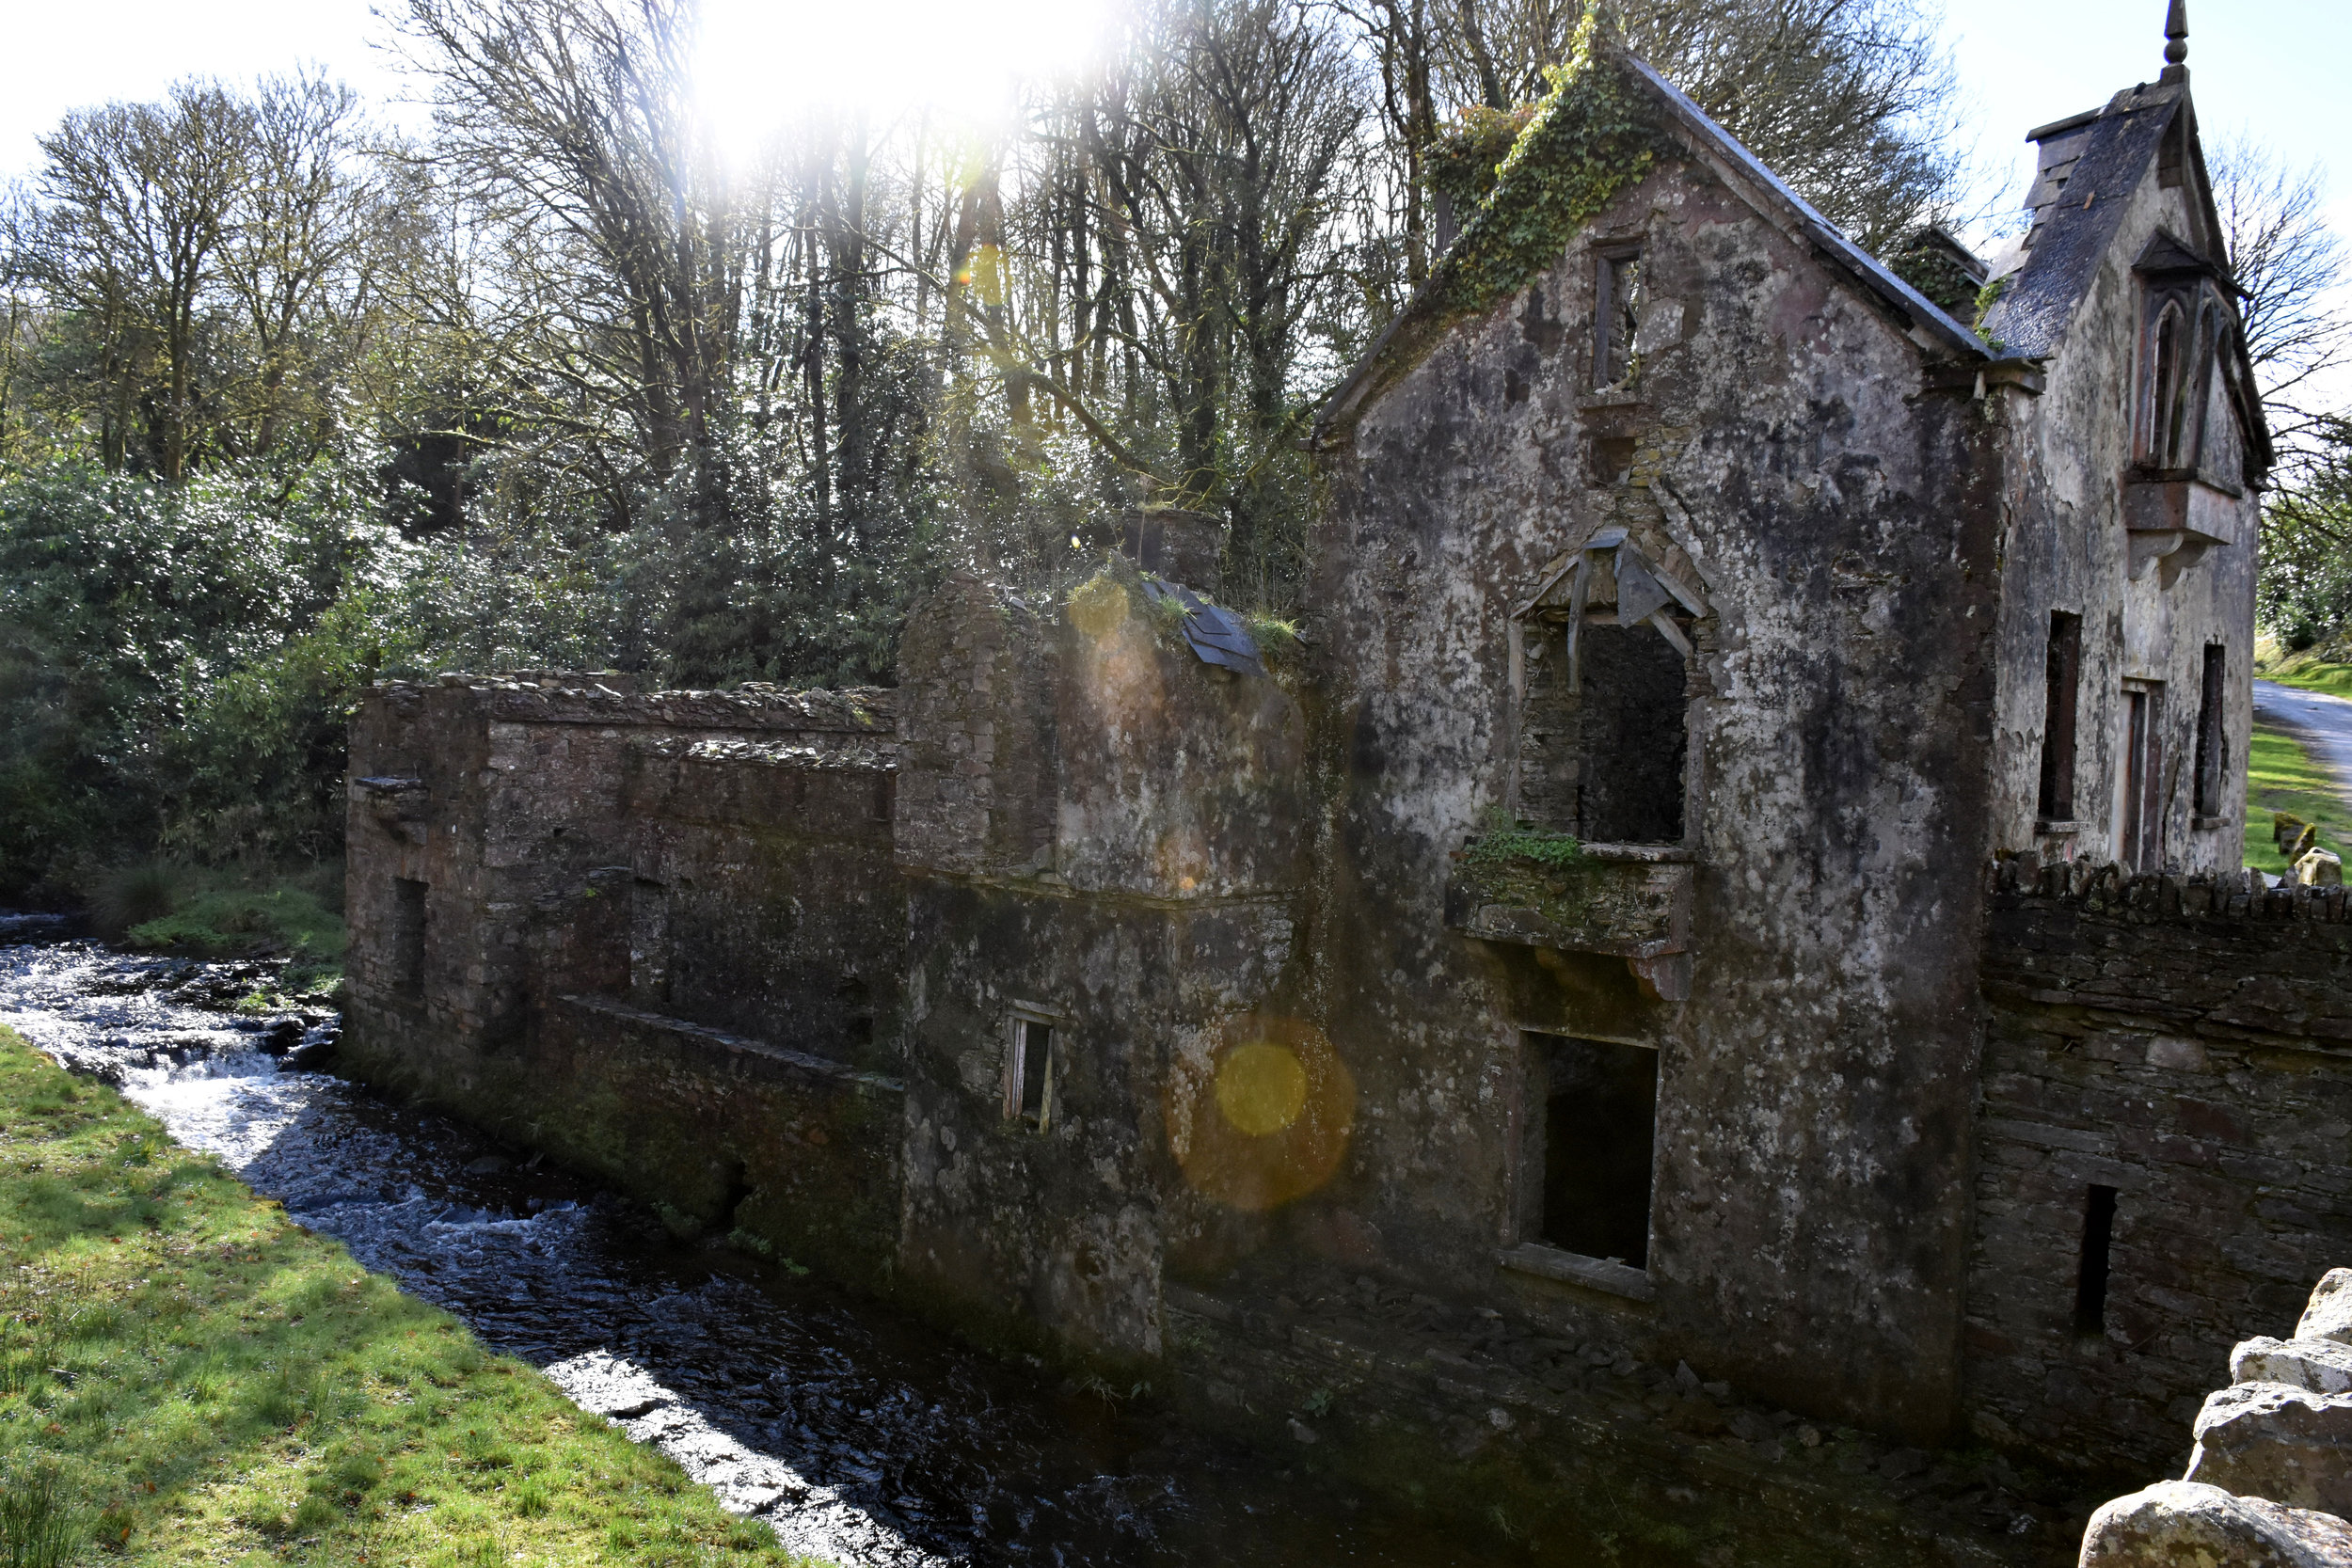 Abandoned building, stream, sun, greeeeeen, repeat.